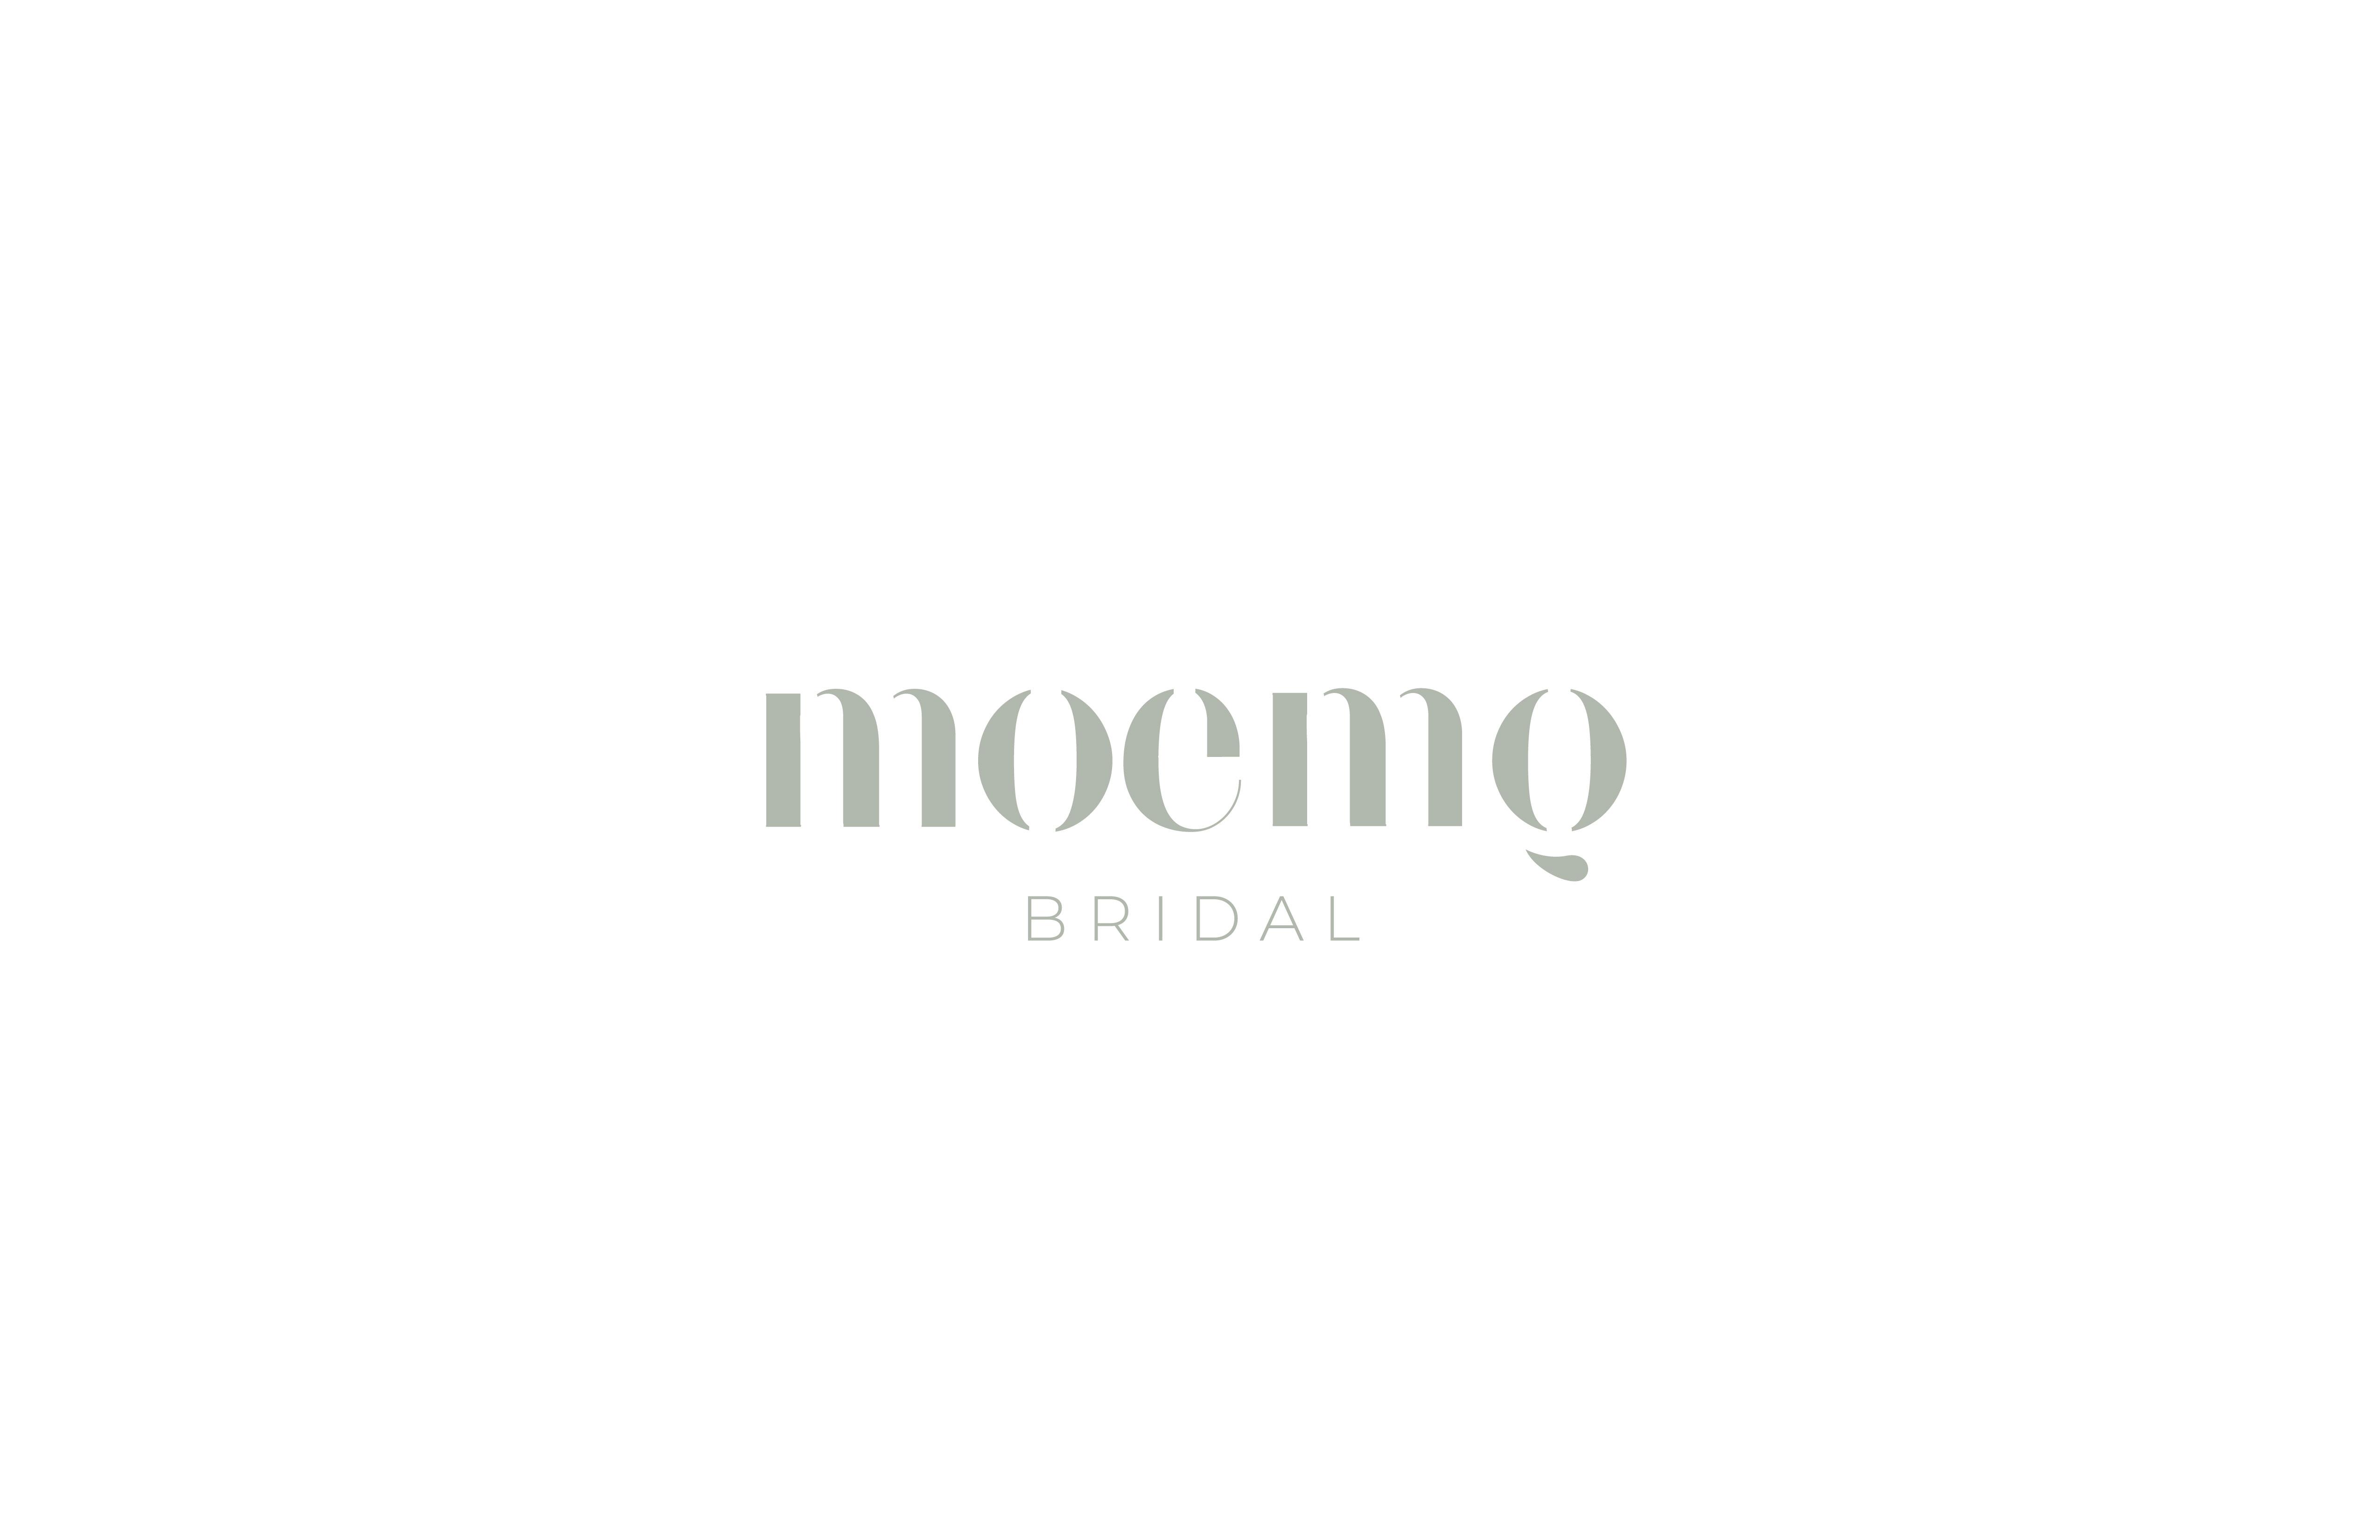 Moemo Bridal